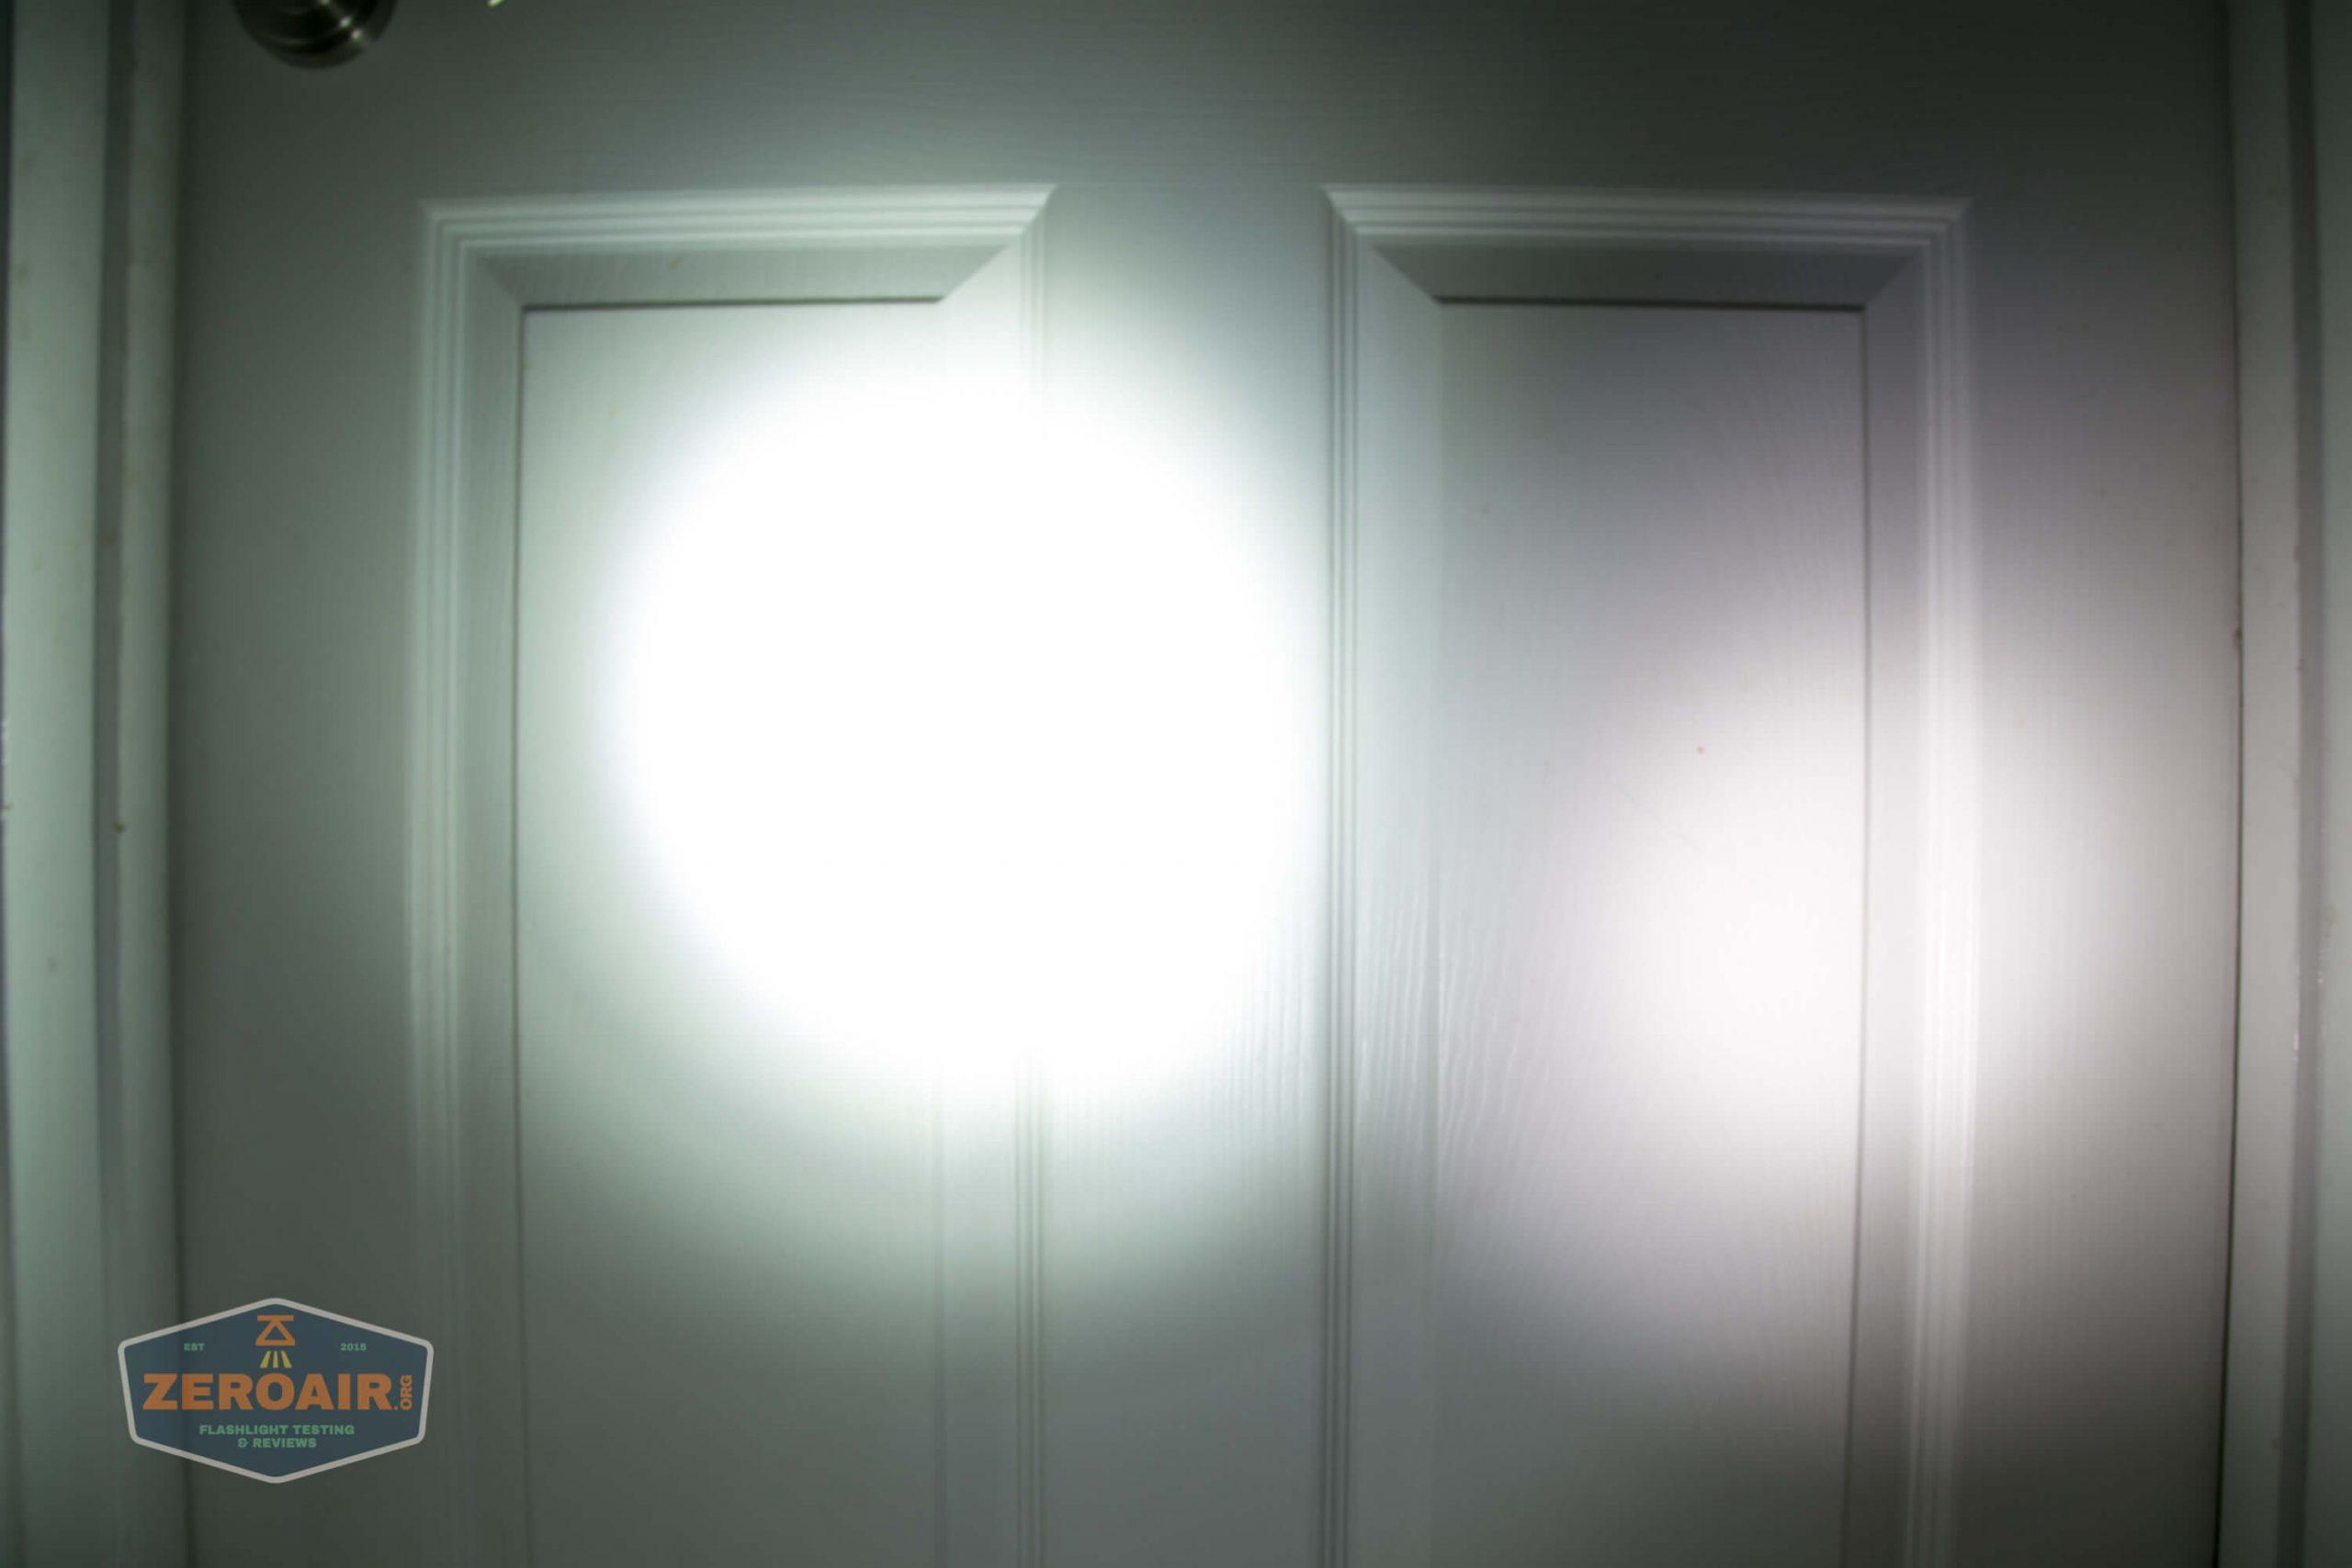 fireflylite e01 luminus sst-40 21700 beamshot door vs blf-348 5